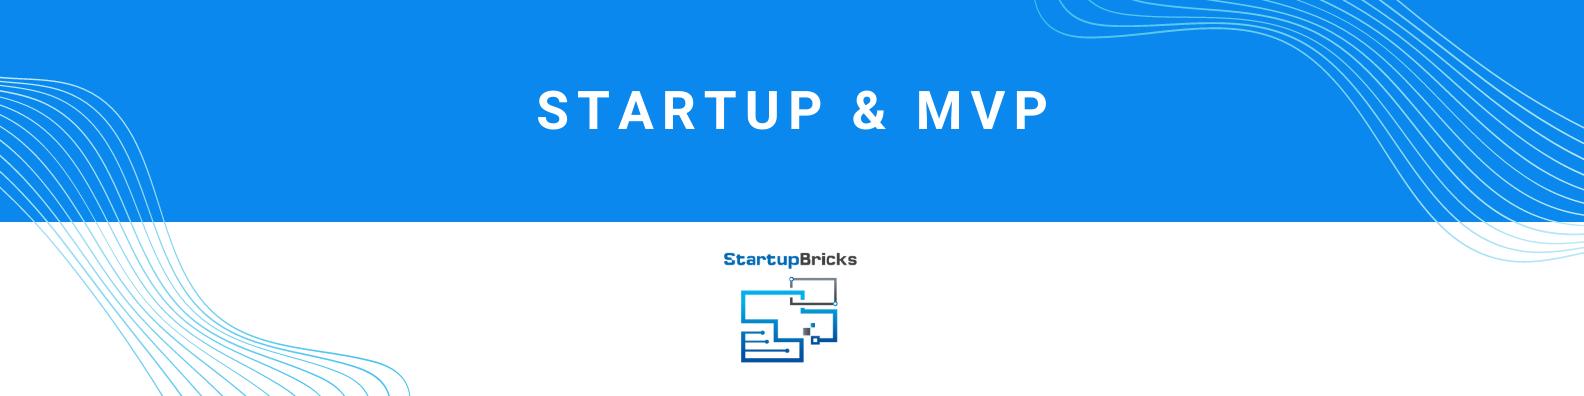 startup mvp